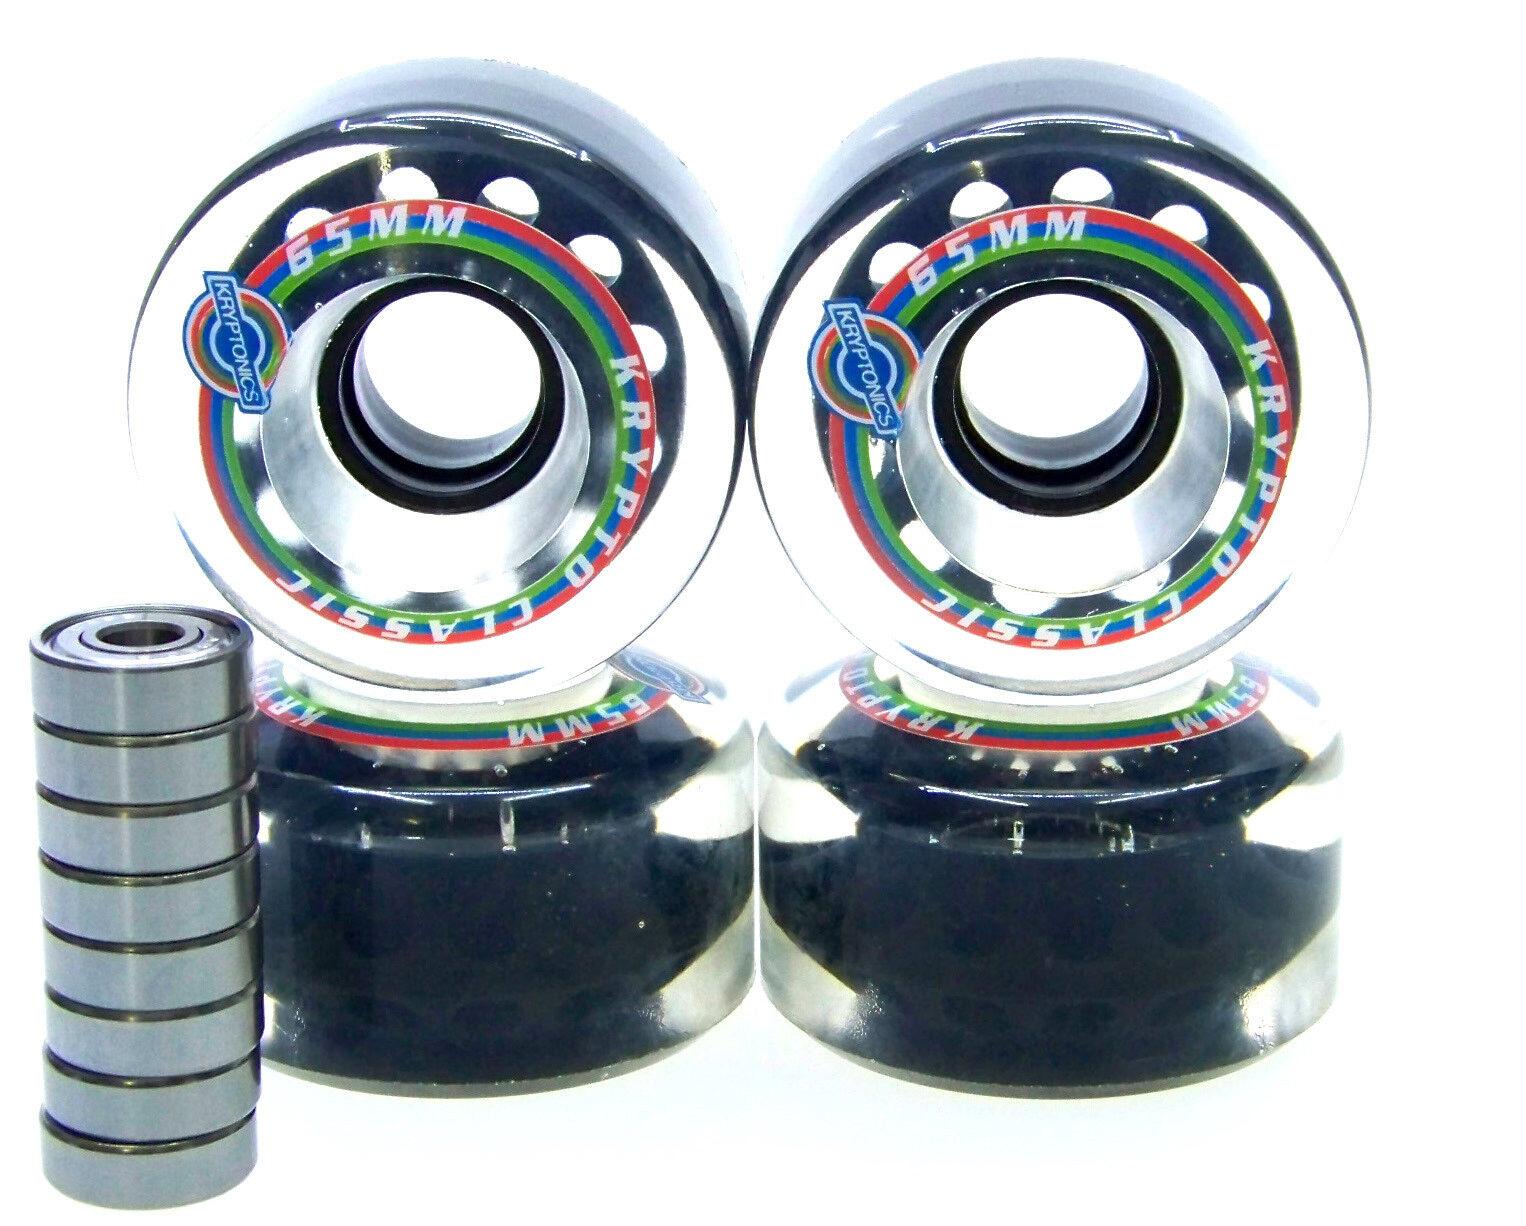 Longboard Rollers KRYPTONICS CLASSIC 2 9 16in 78A ABEC Bearing Set